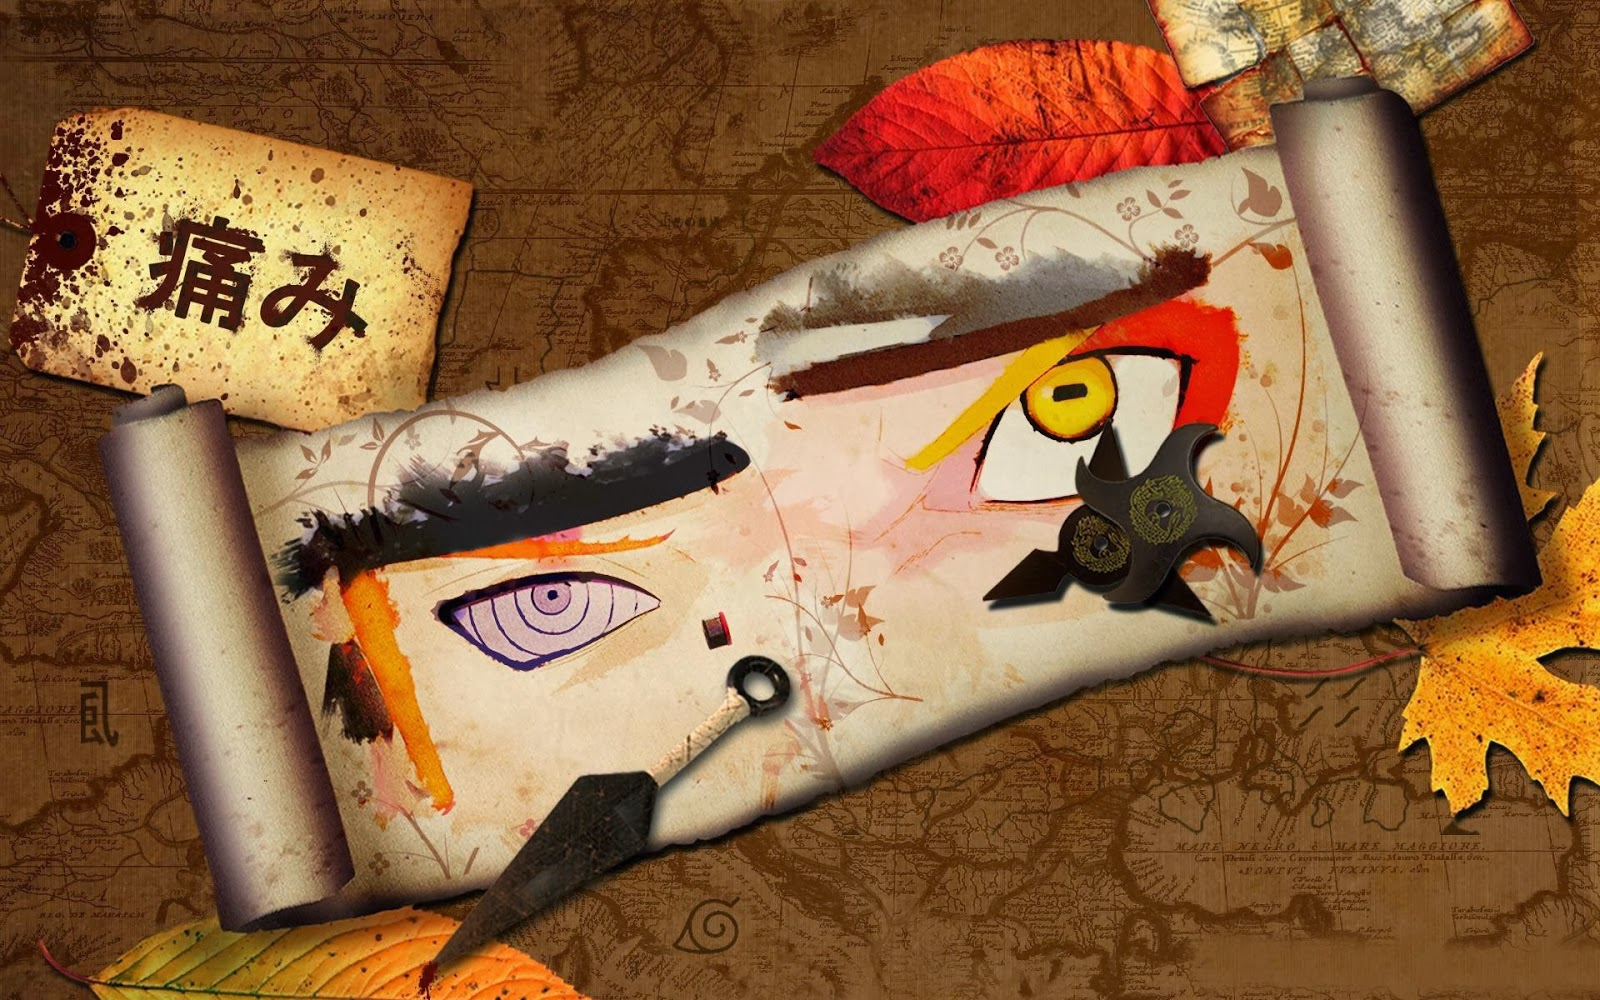 naruto-uzumaki-anime-wallpaper-1920x1200